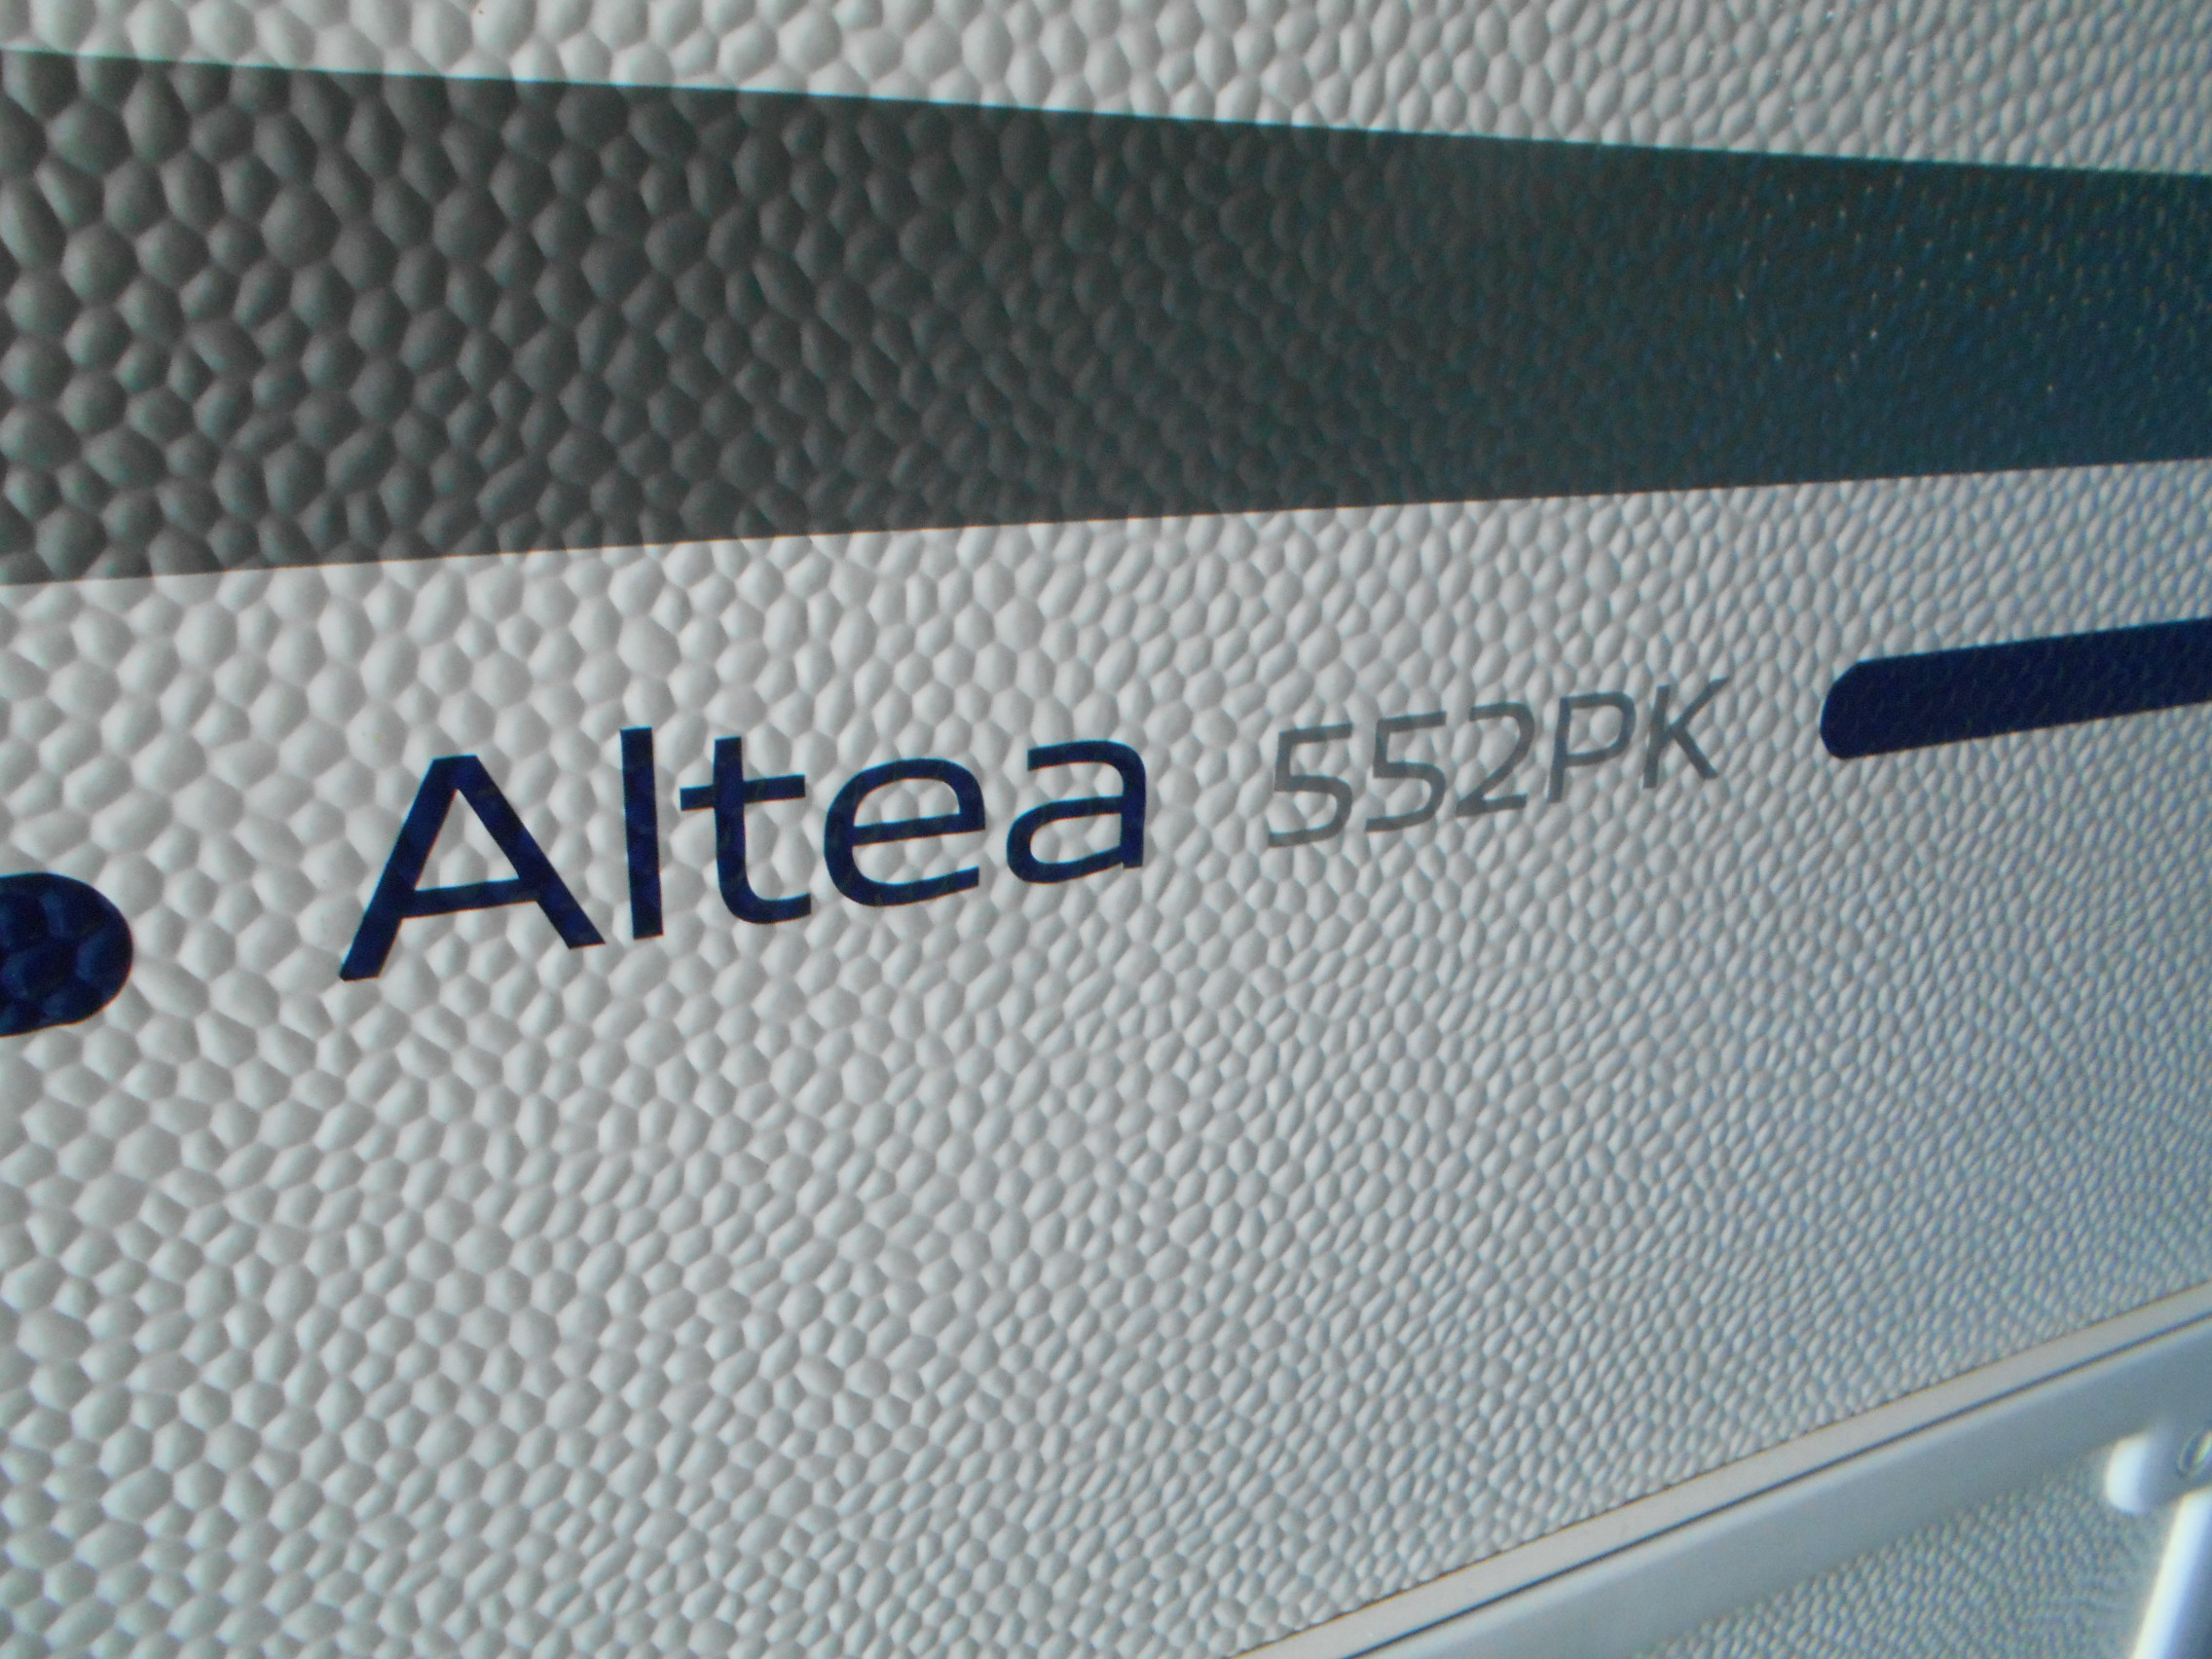 ALTEA 552 PK 快適装備インストール!